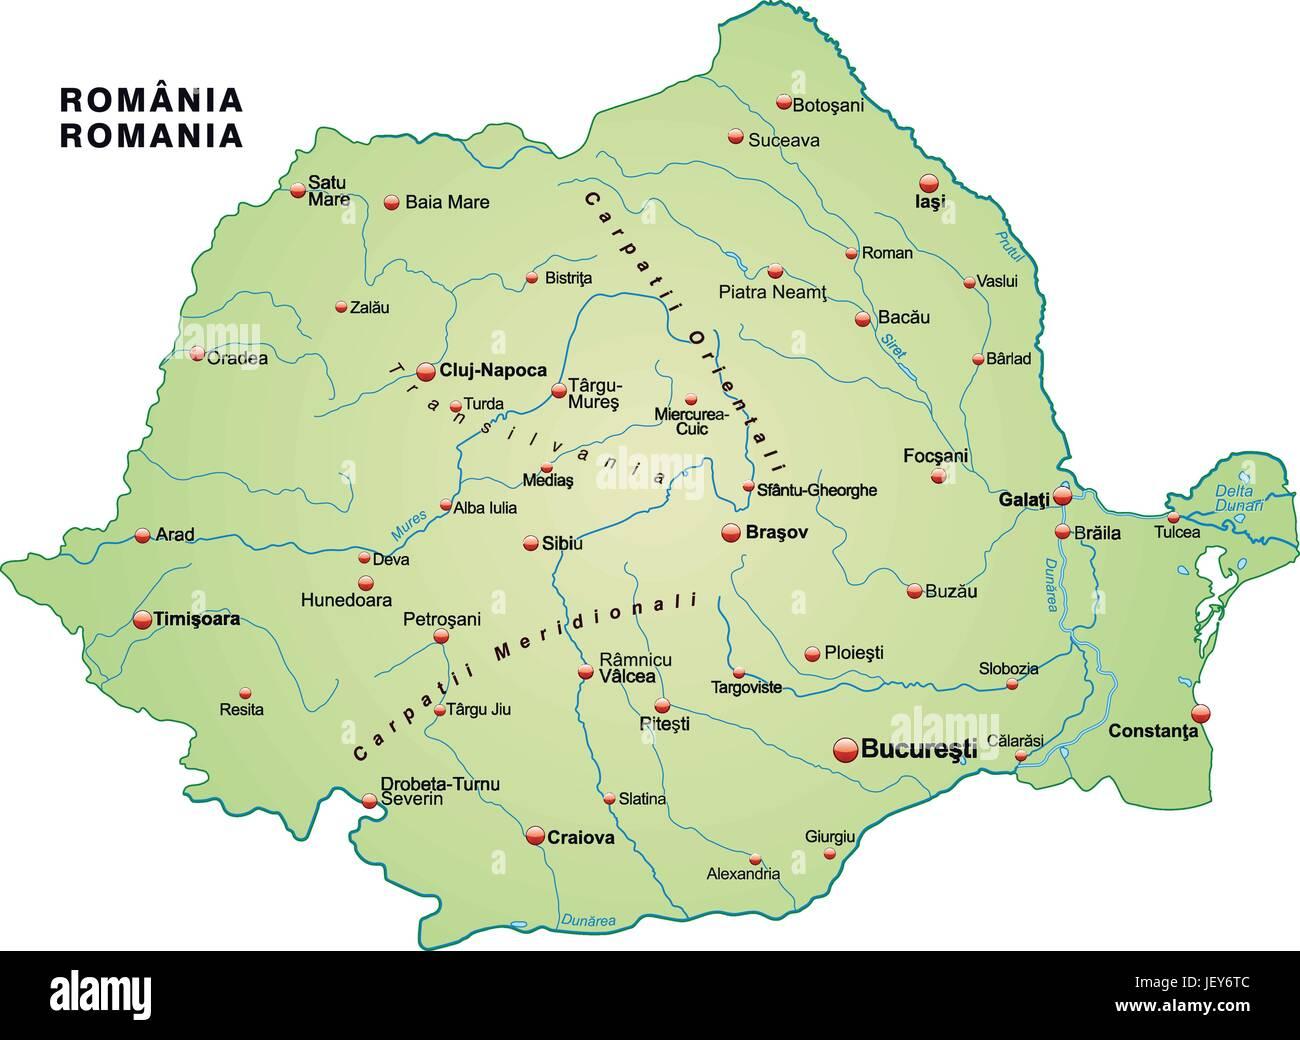 Card, Outline, Romania, Borders, Atlas, Map Of The World, Map, Rumnienkarte,